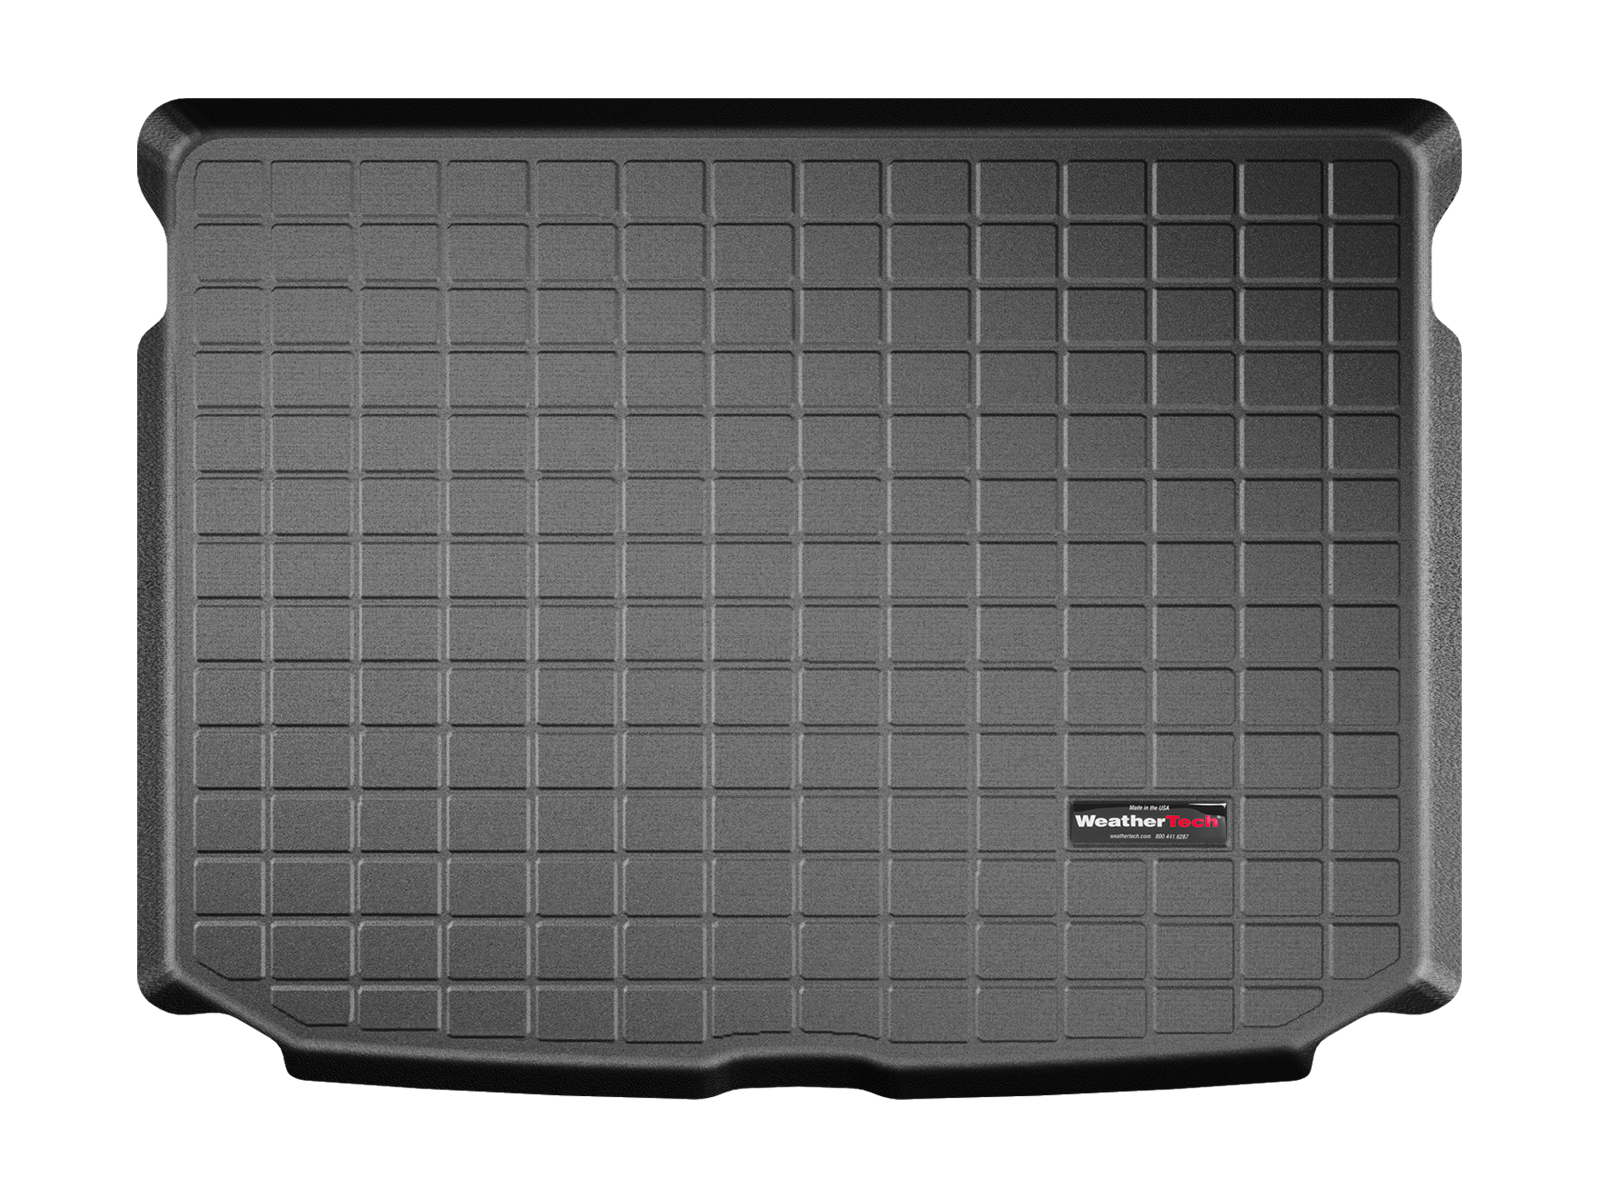 Audi A3 S3 2013>2017 Vasca proteggi baule tappeto bagagliaio nero *21